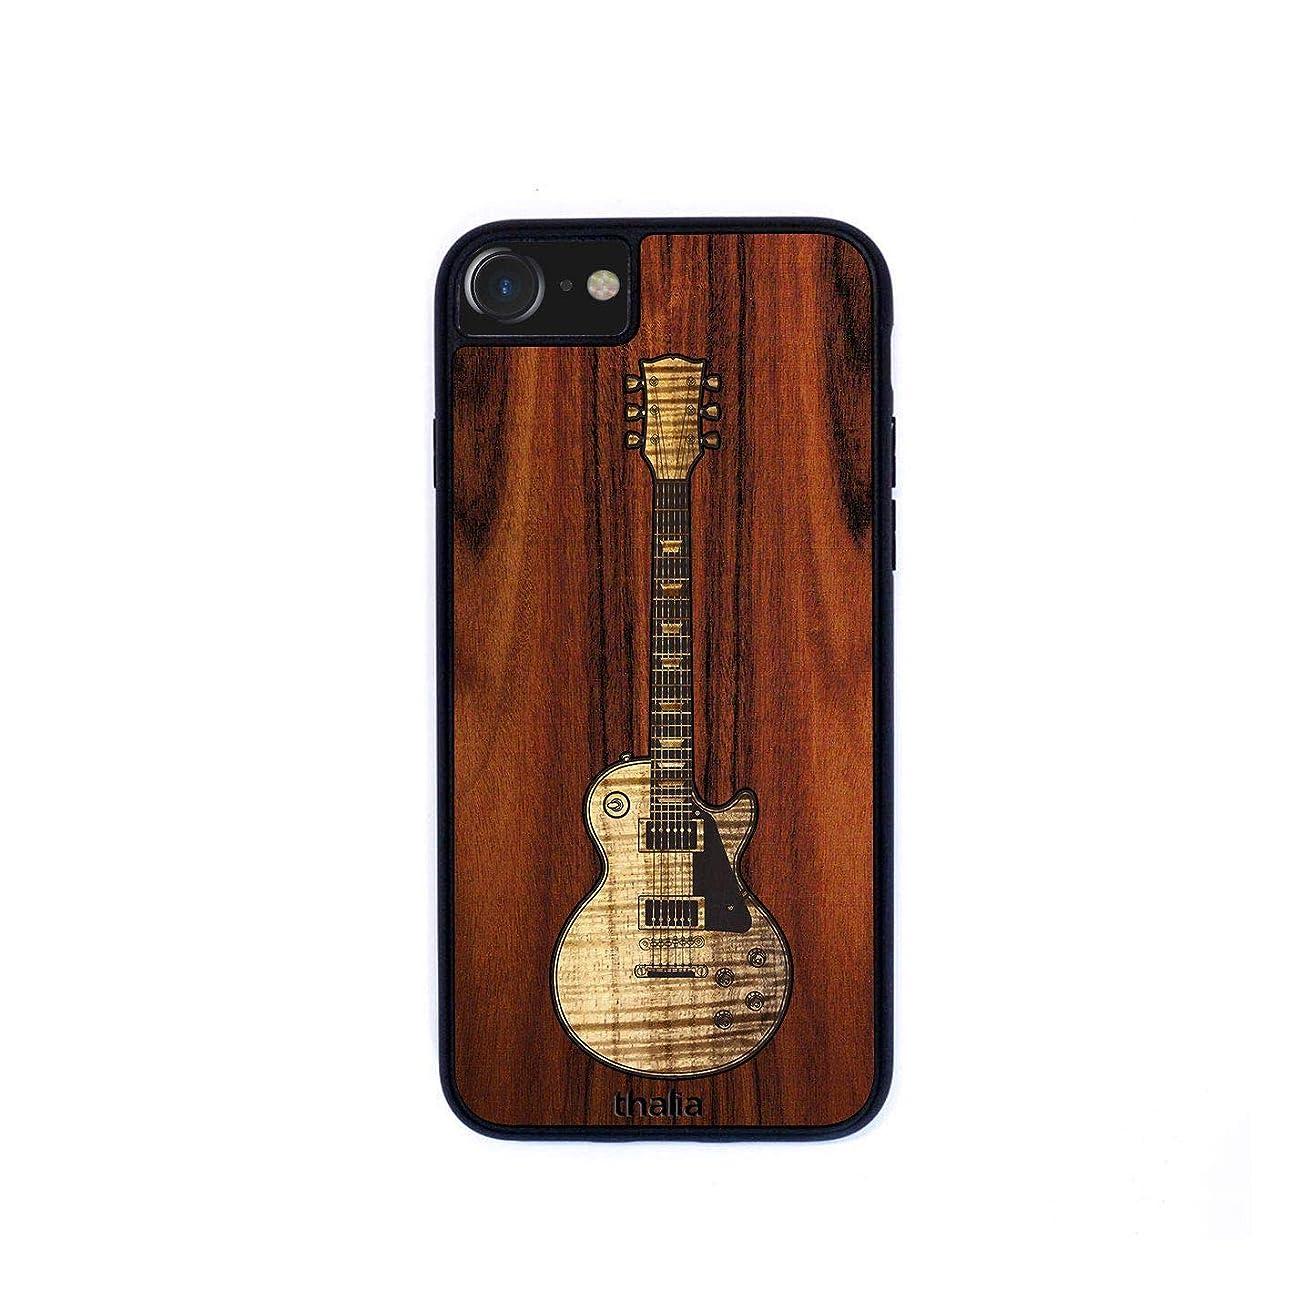 Santos Rosewood & Les Paul Hawaiian Koa Inlaid Guitar Phone Case   Thalia Exotic Wood Cases iPhone 6/7/8